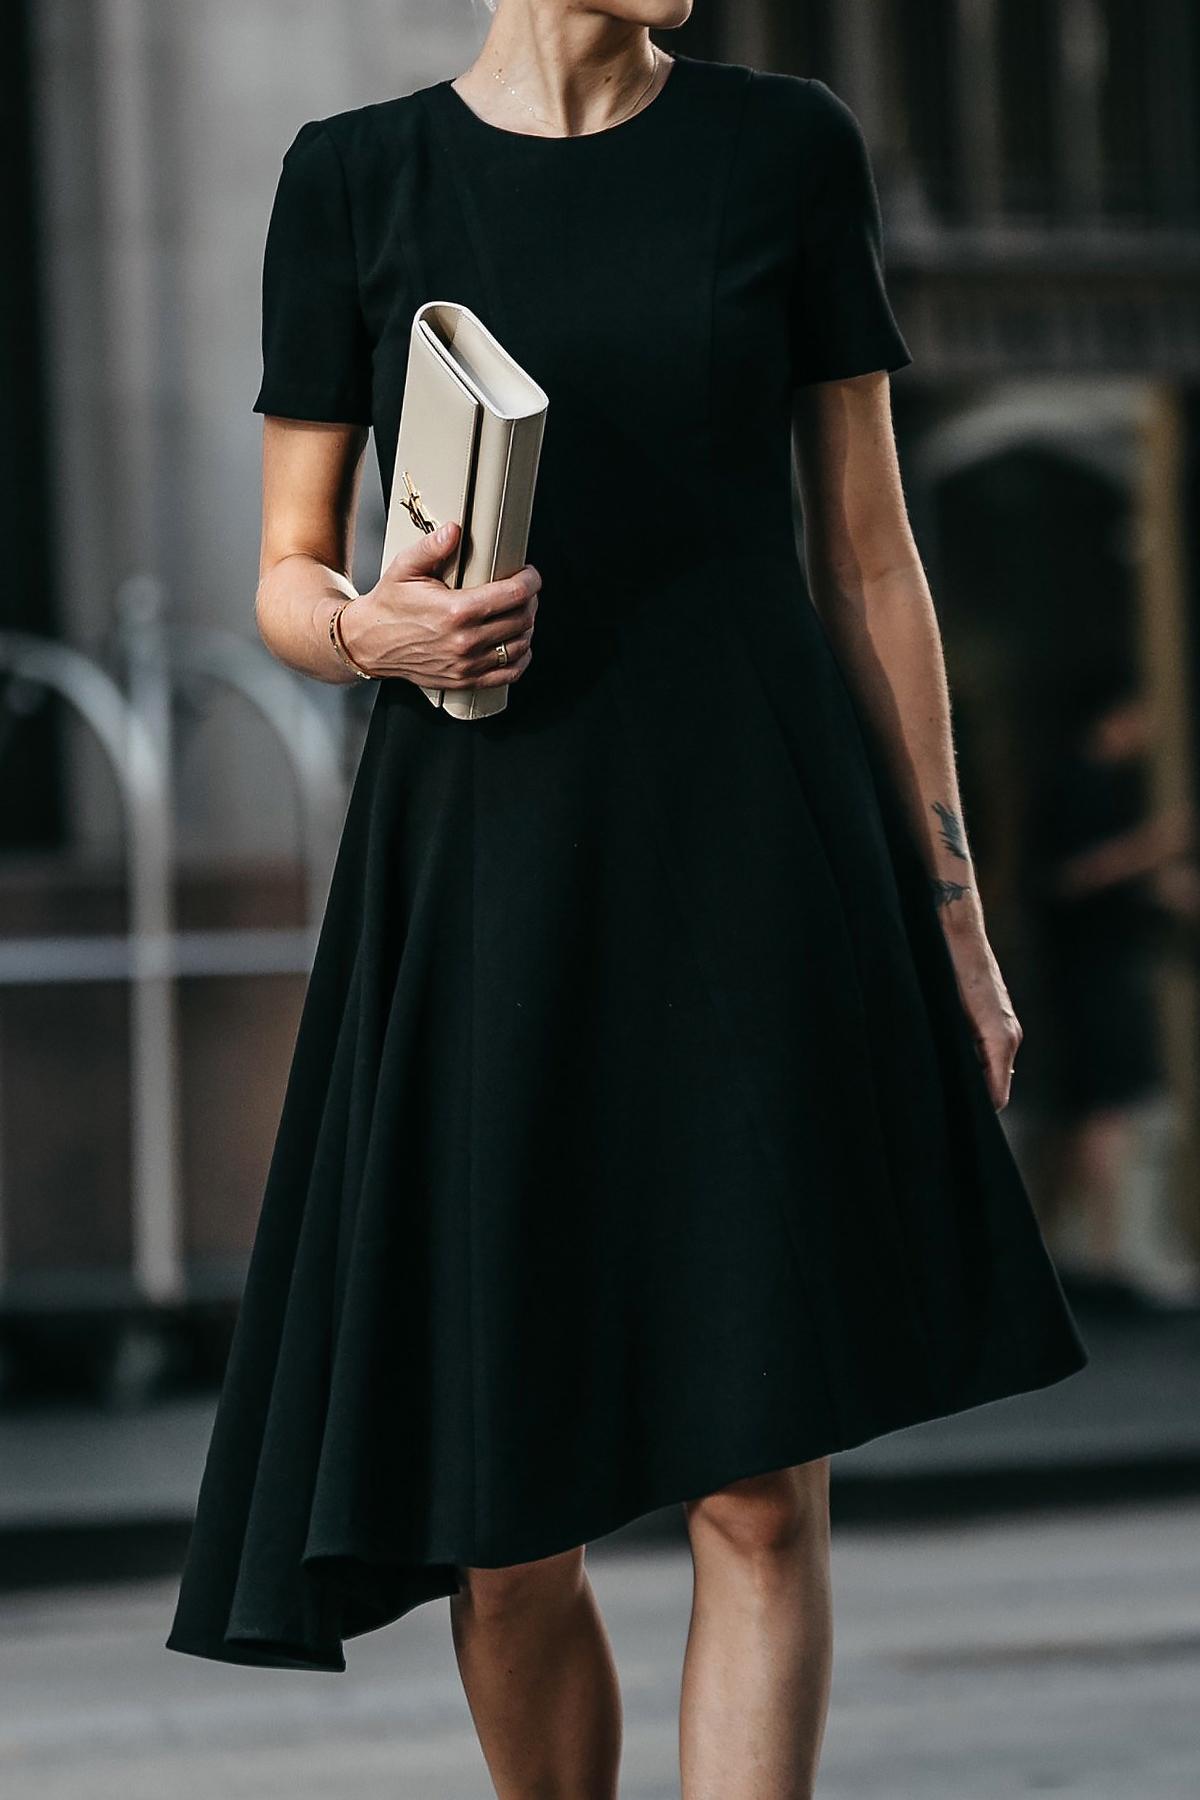 bf55ee16e97f Black Halo Asymmetrical Little Black Dress Saint Laurent Nude Clutch  Fashion Jackson Dallas Blogger Fashion Blogger